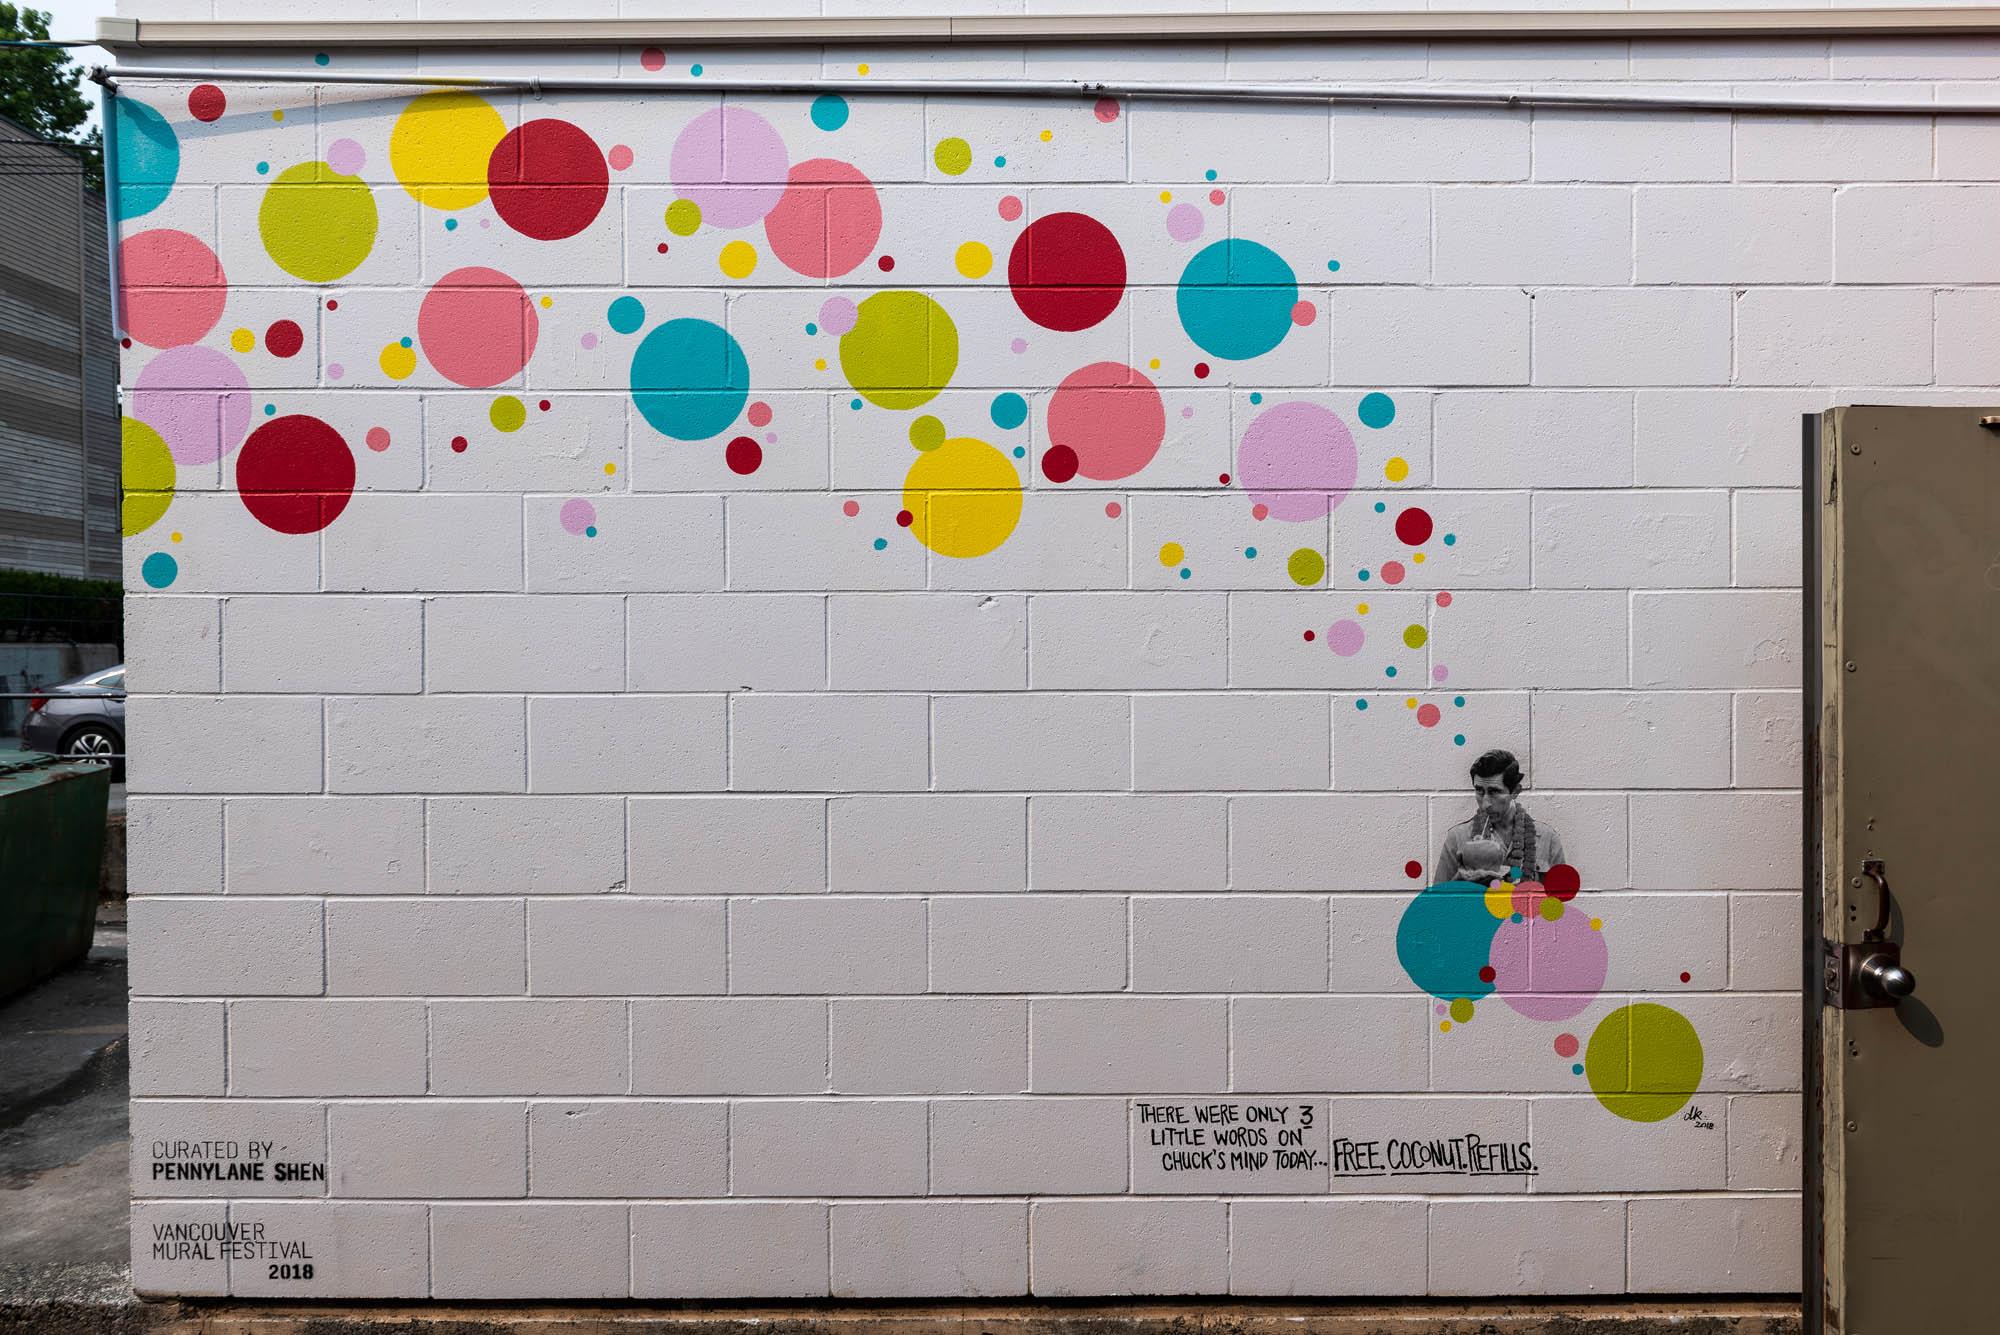 GabrielMartins_VMF_Murals2018_20180813_006.jpg